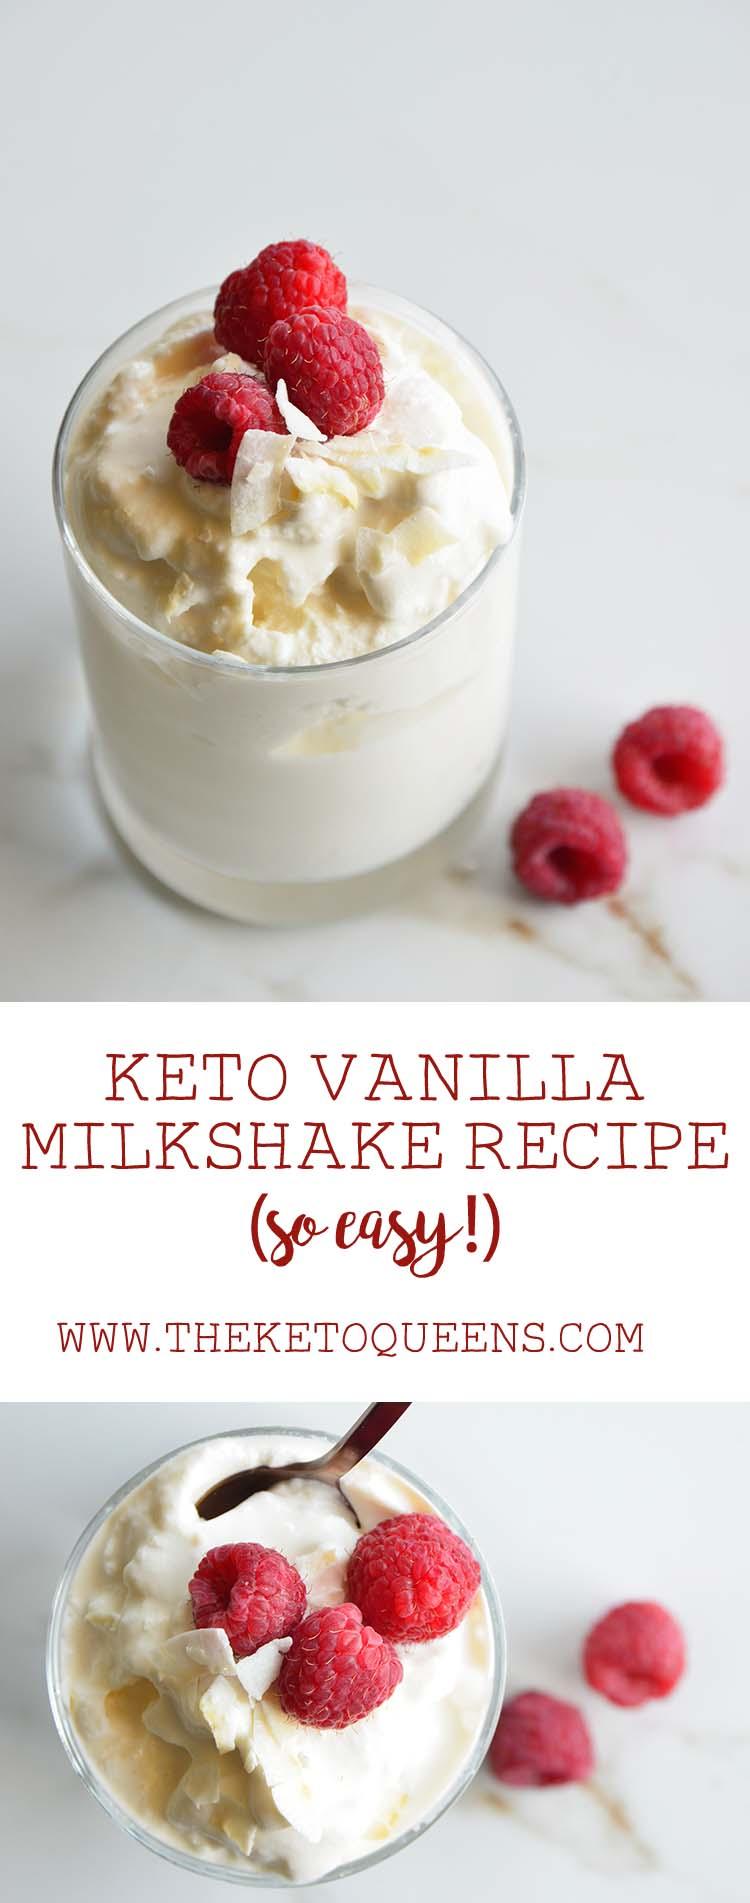 #Keto Vanilla Milkshake Recipe - rich + creamy and just 3 ingredients! #lowcarb #ketoaf